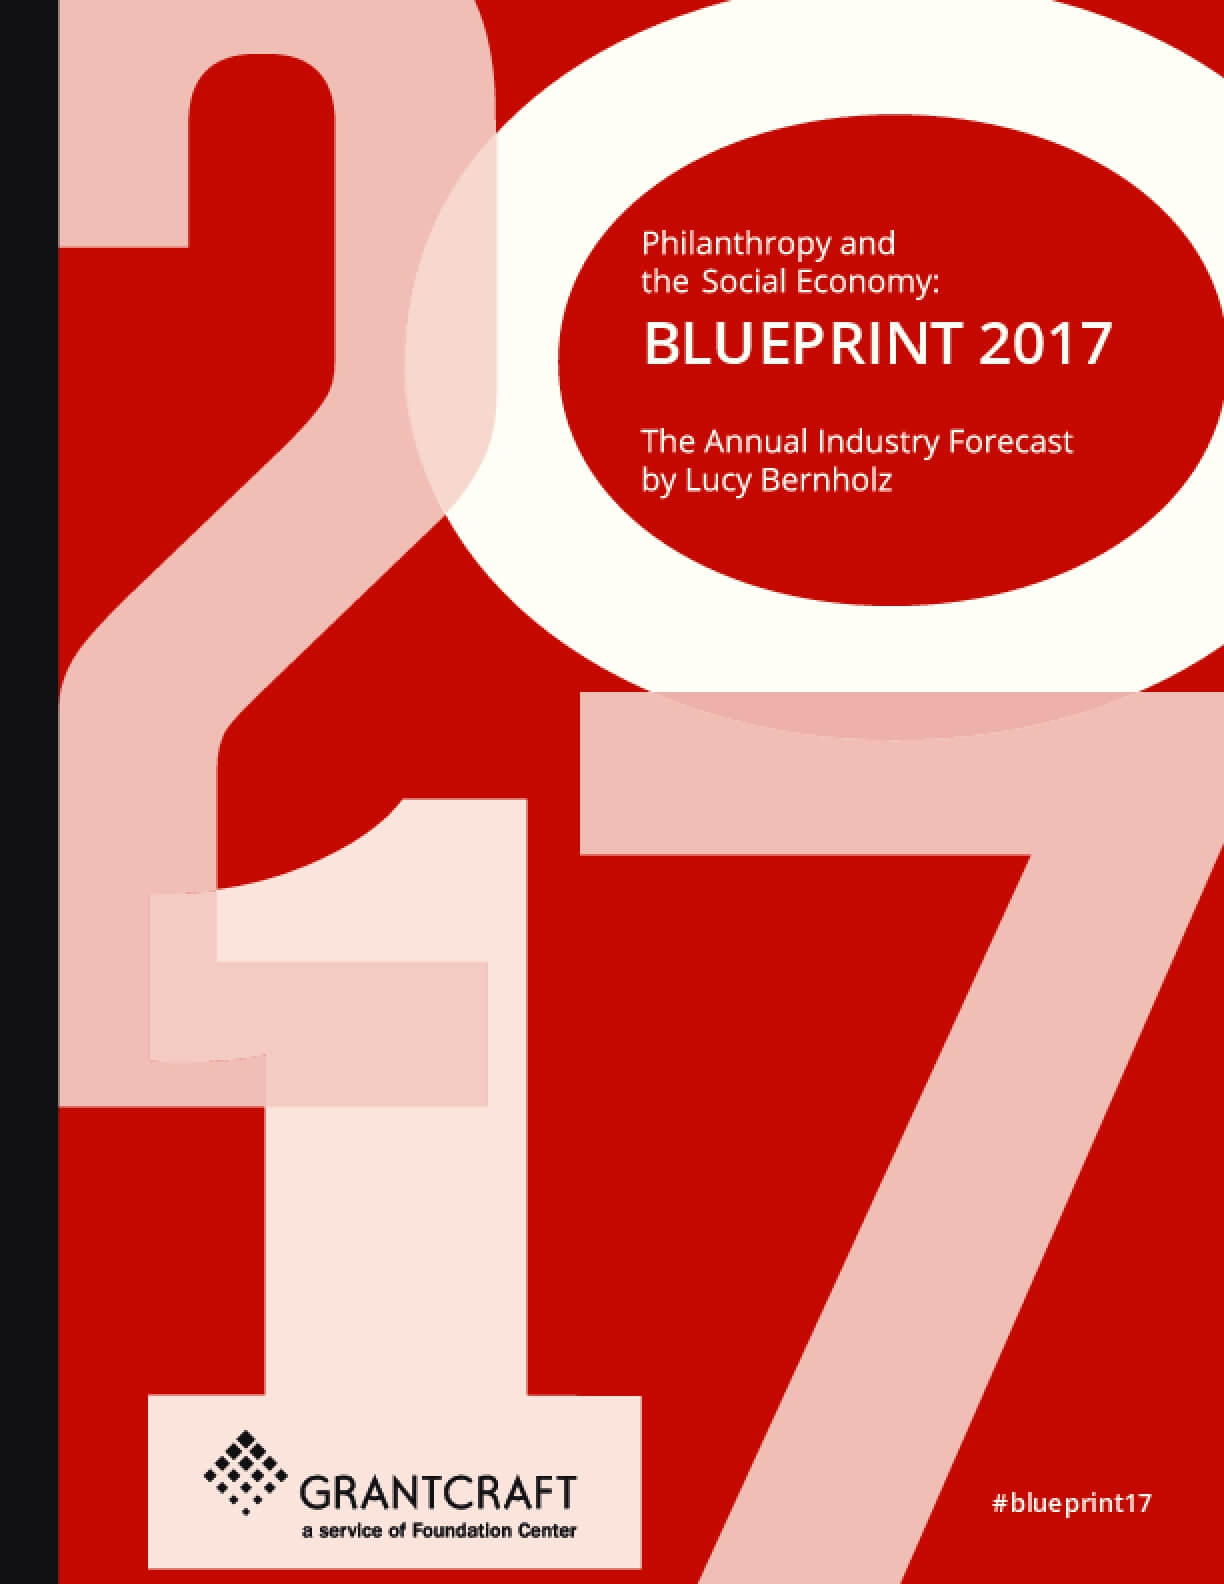 Philanthropy and the Social Economy: Blueprint 2017